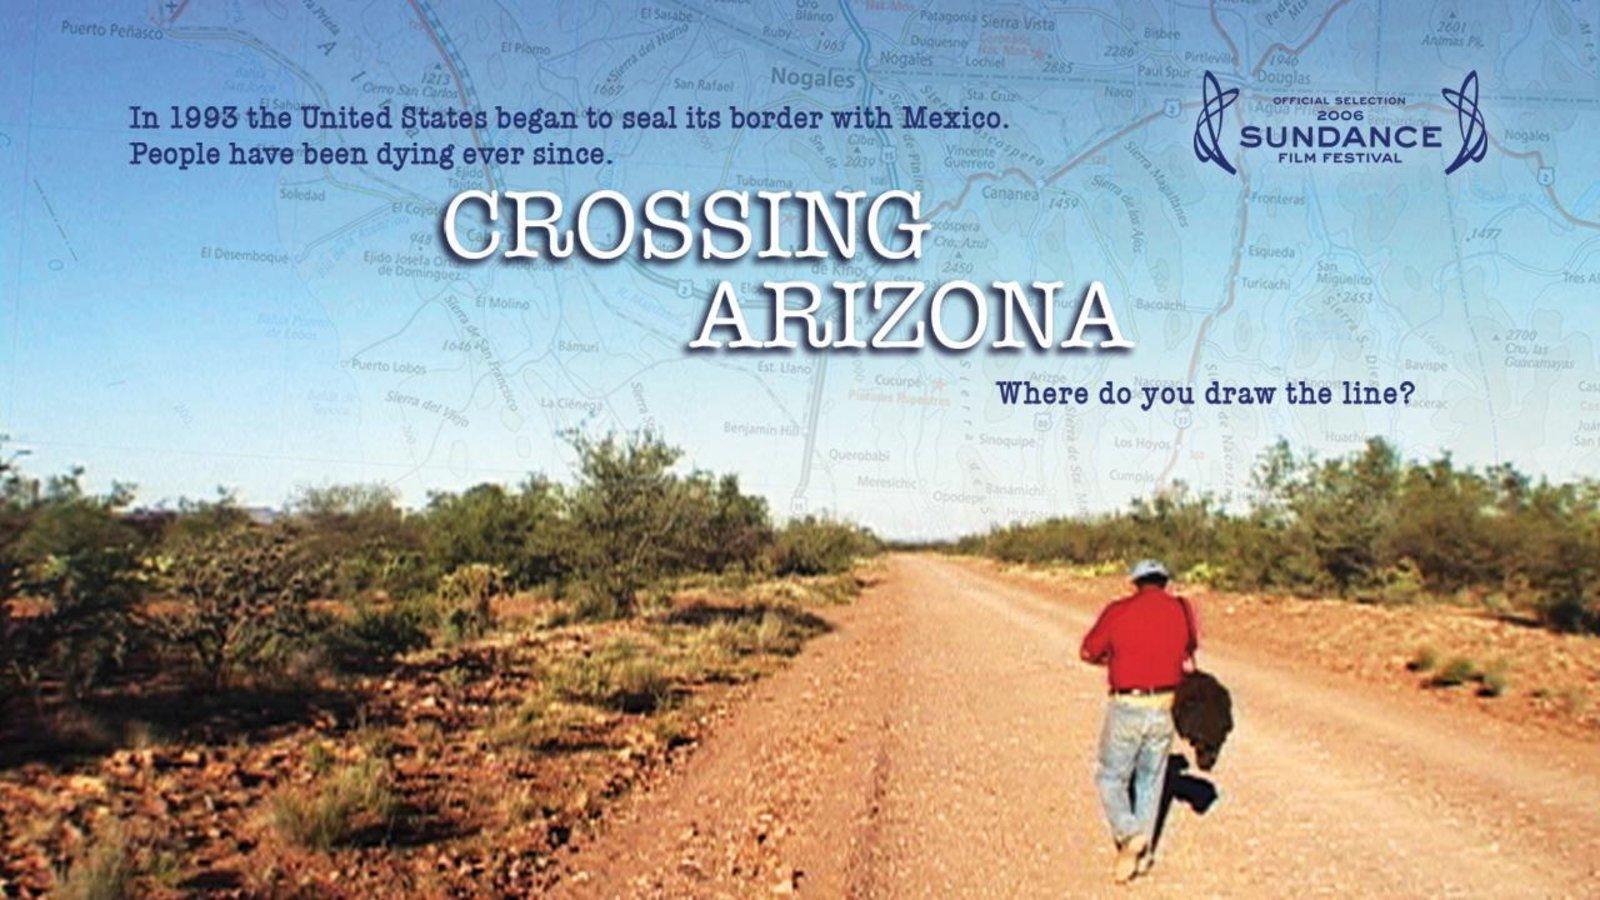 Crossing Arizona - The Immigration Crisis in Arizona